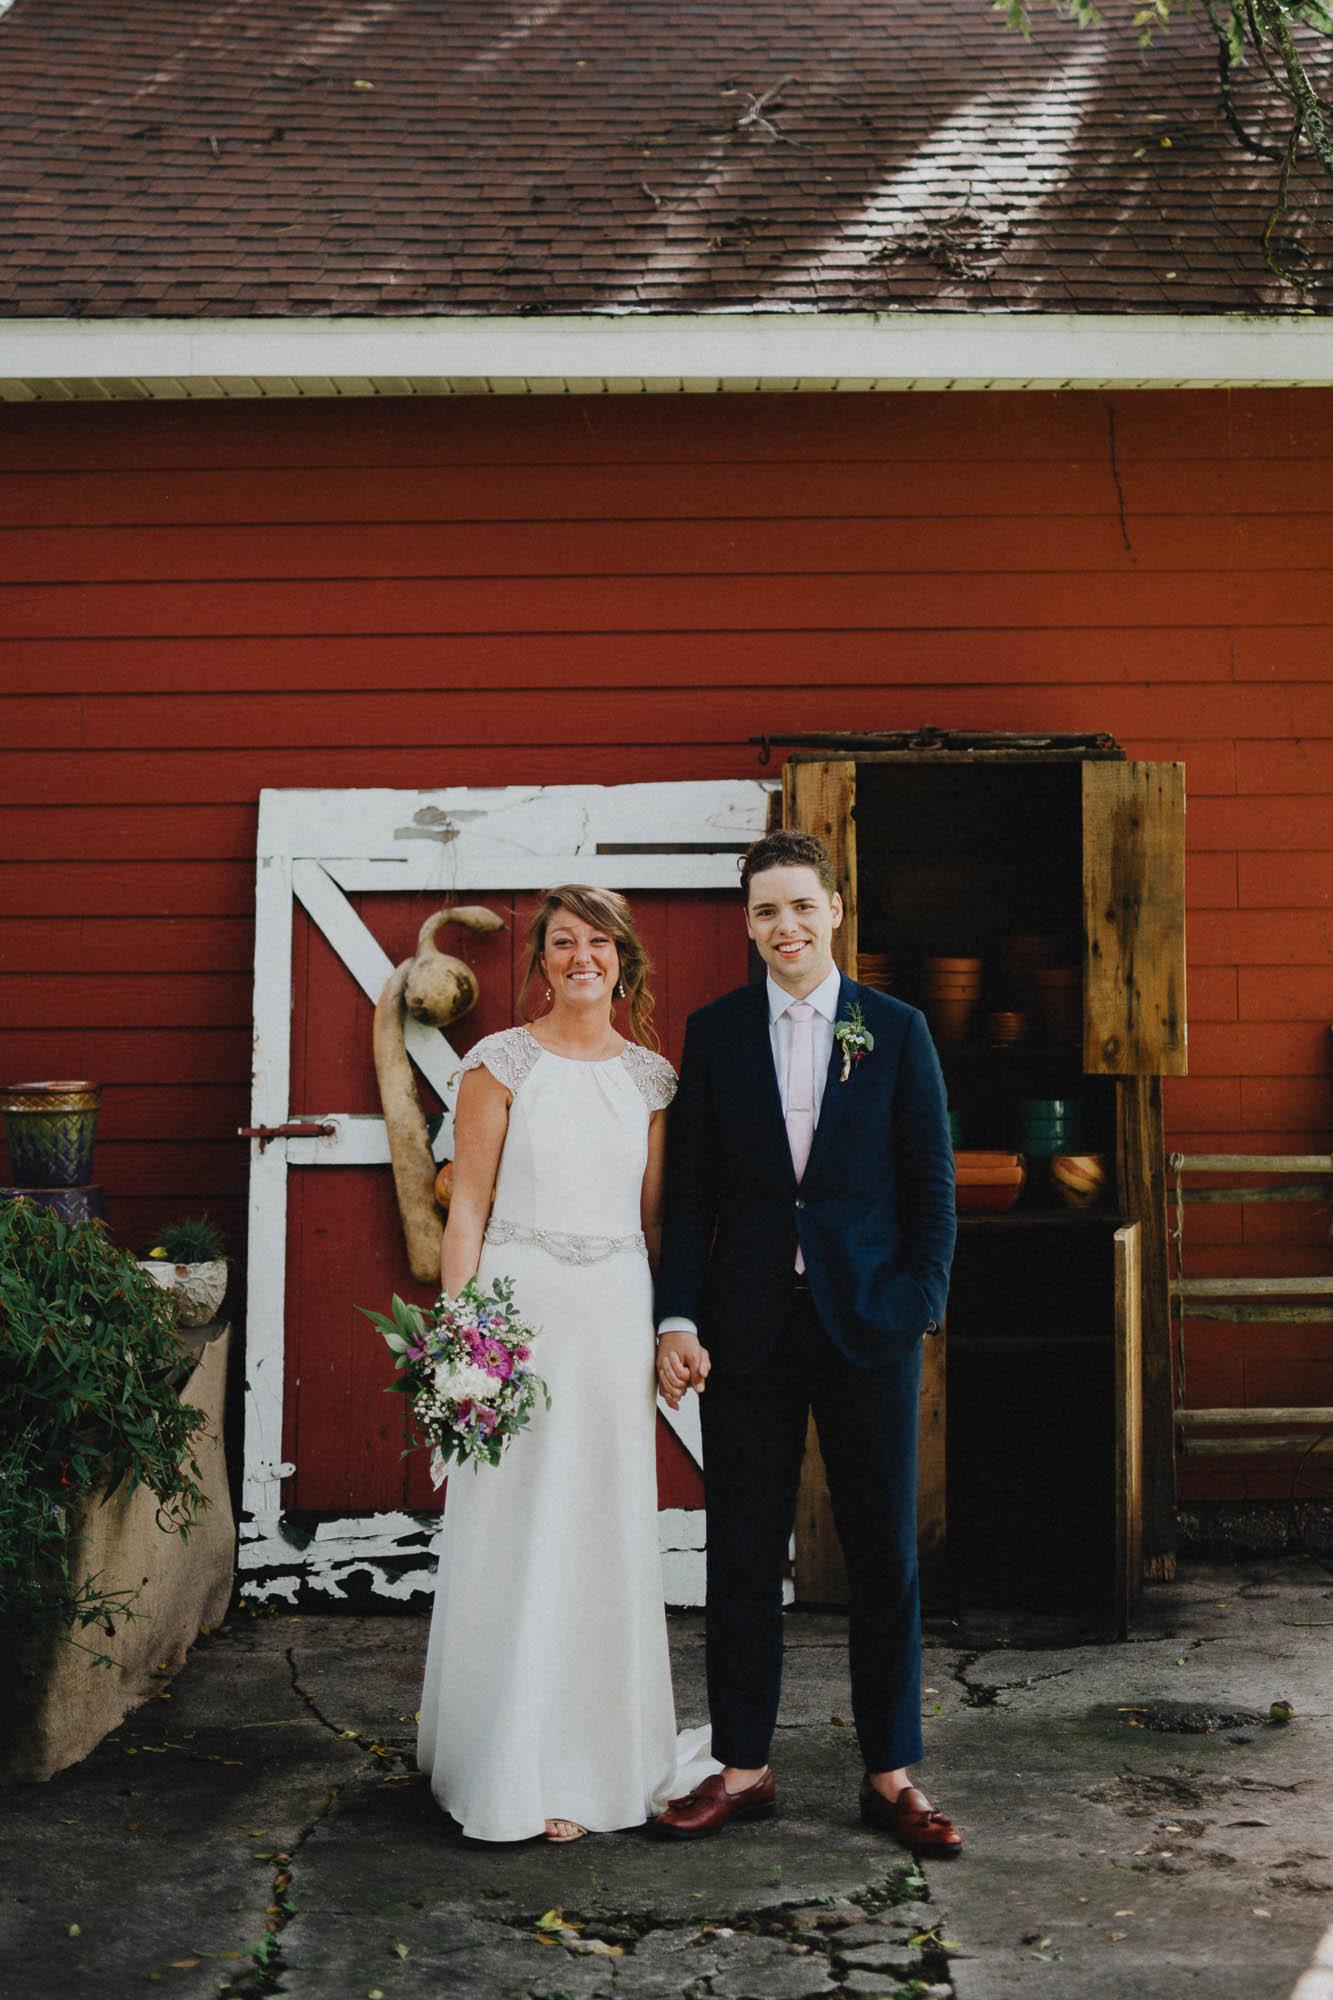 Leah-Graham-Michigan-Outdoor-DIY-Wedding-073@2x.jpg